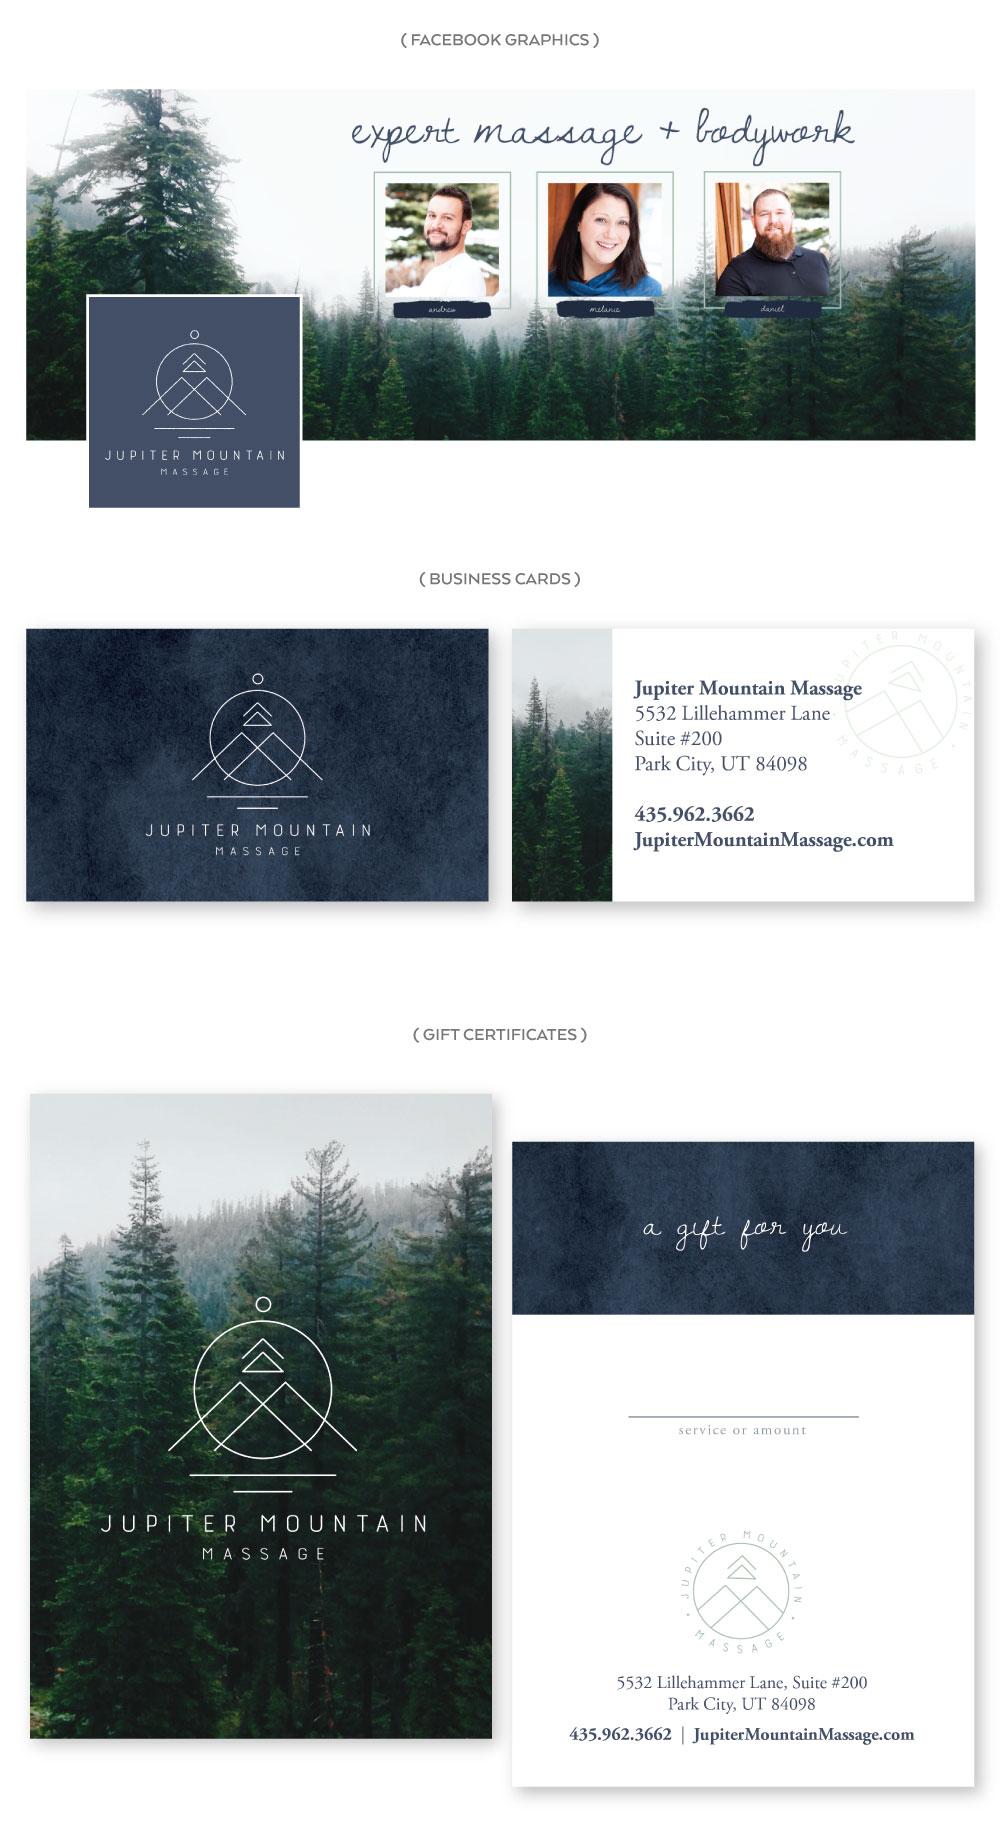 Jupiter-Mountain-Park-City-Graphic-Design.jpg